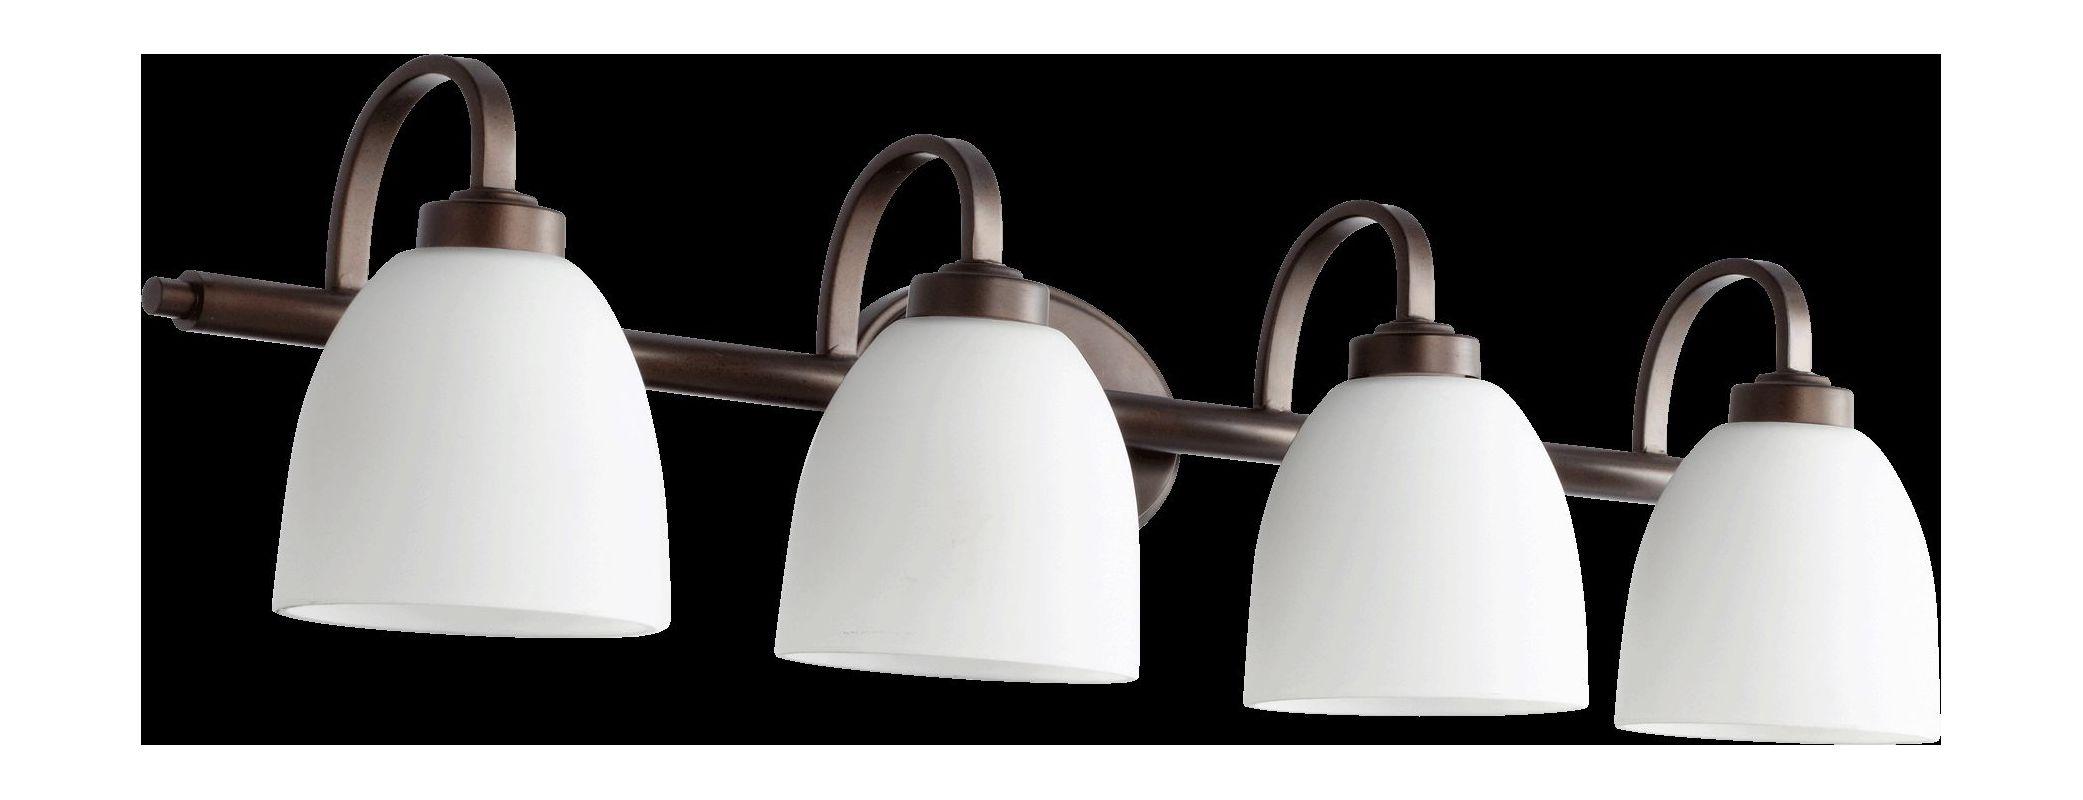 Quorum International 5060-4 Reyes 4 Light Bathroom Vanity Light Oiled